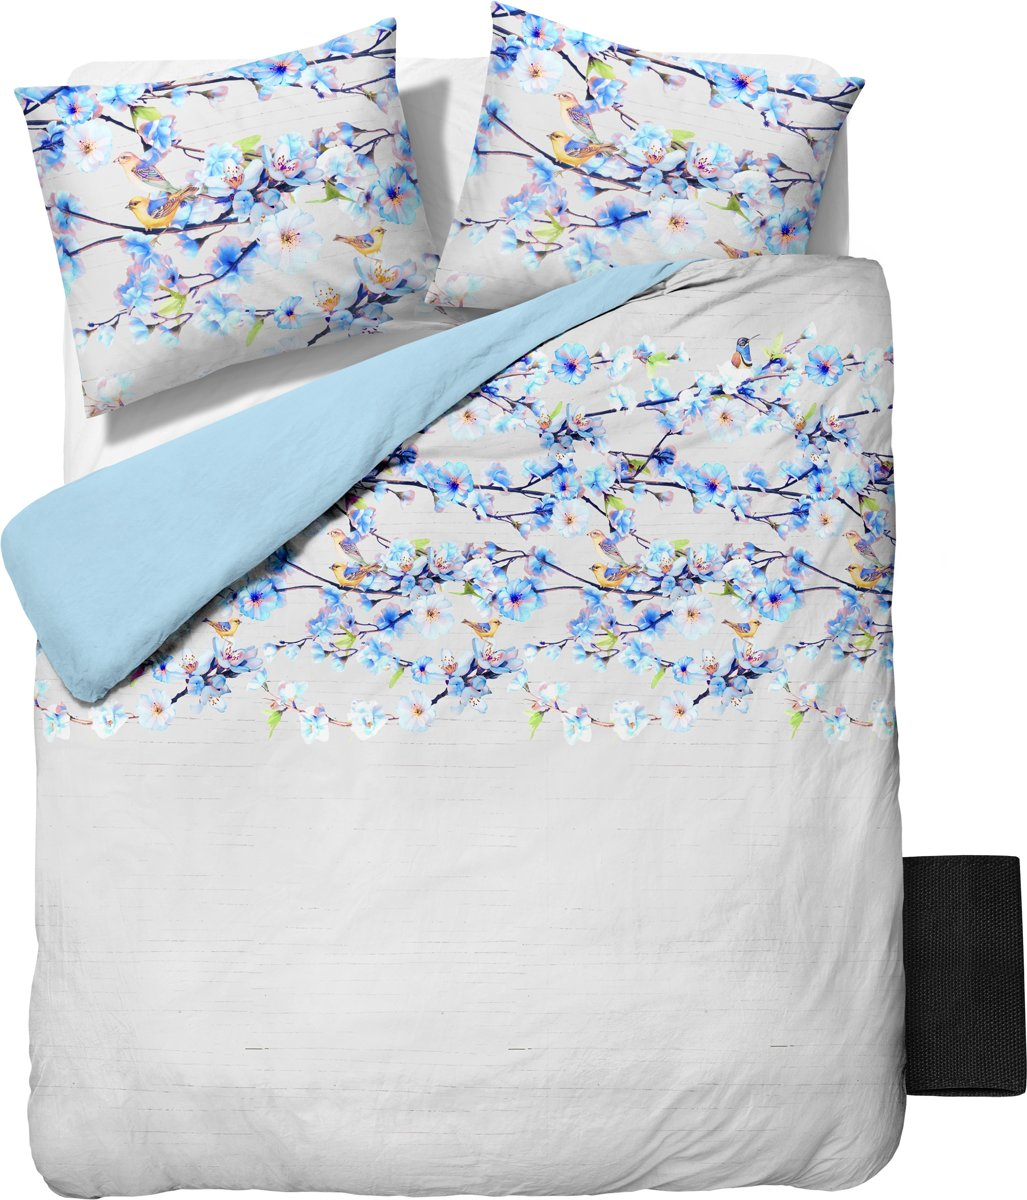 Sleeptime Katoen Marrelly - Dekbedovertrekset - Lits-Jumeaux - 240x200/220 cm + 2 kussenslopen 60x70 cm - Turquoise kopen